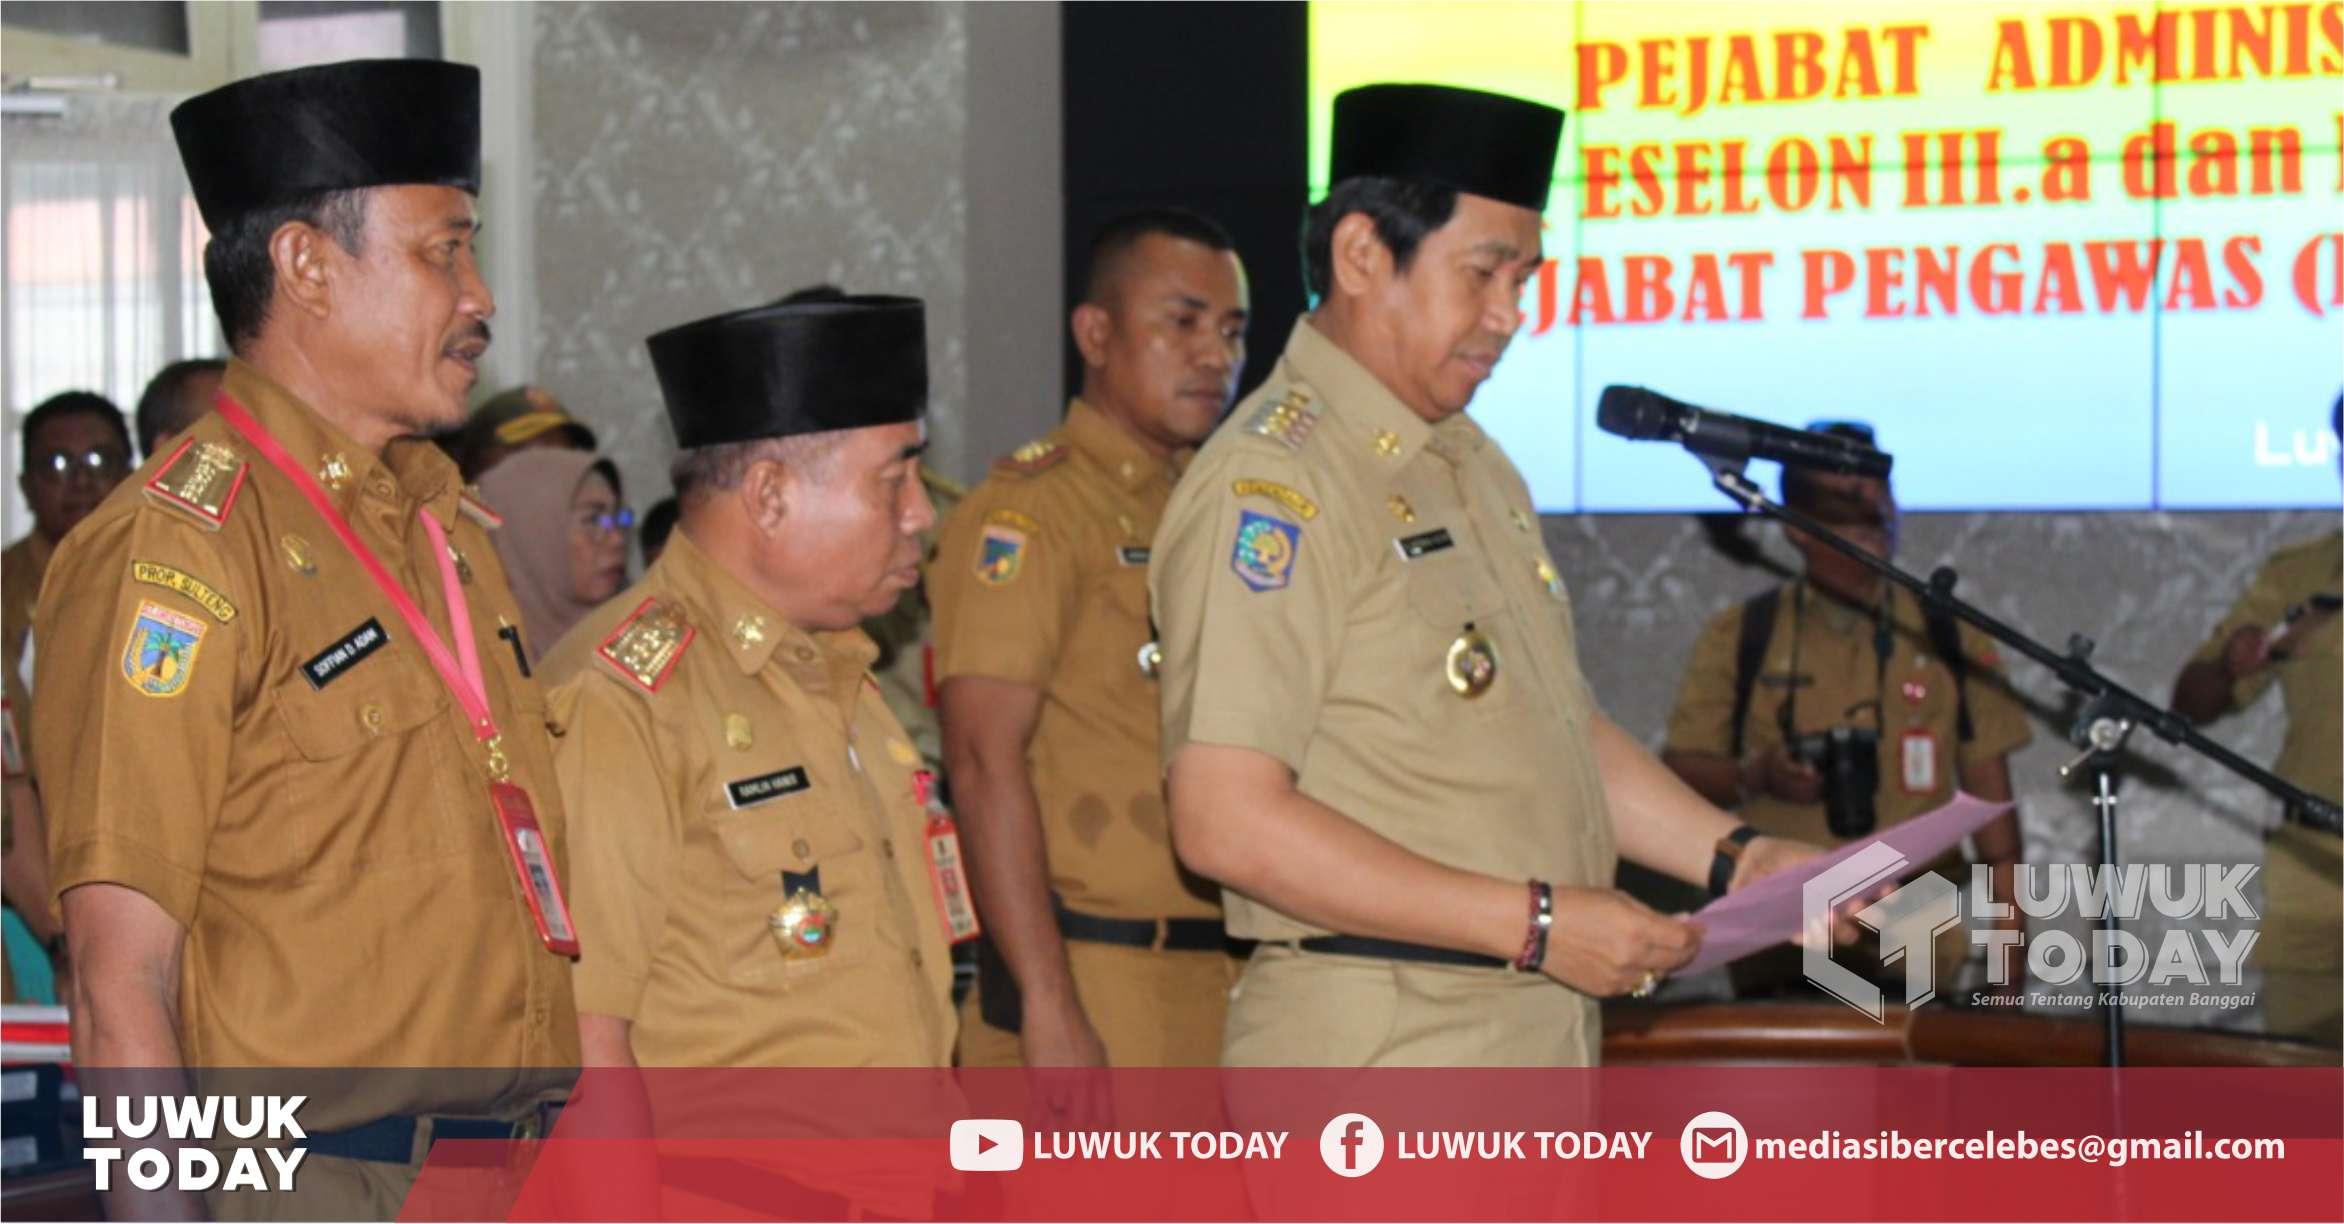 Foto Bupati Banggai H. Herwin Yatim melantik sejumlah pejabat dilingkungan Pemkab Banggai, senin (4/11/2019).